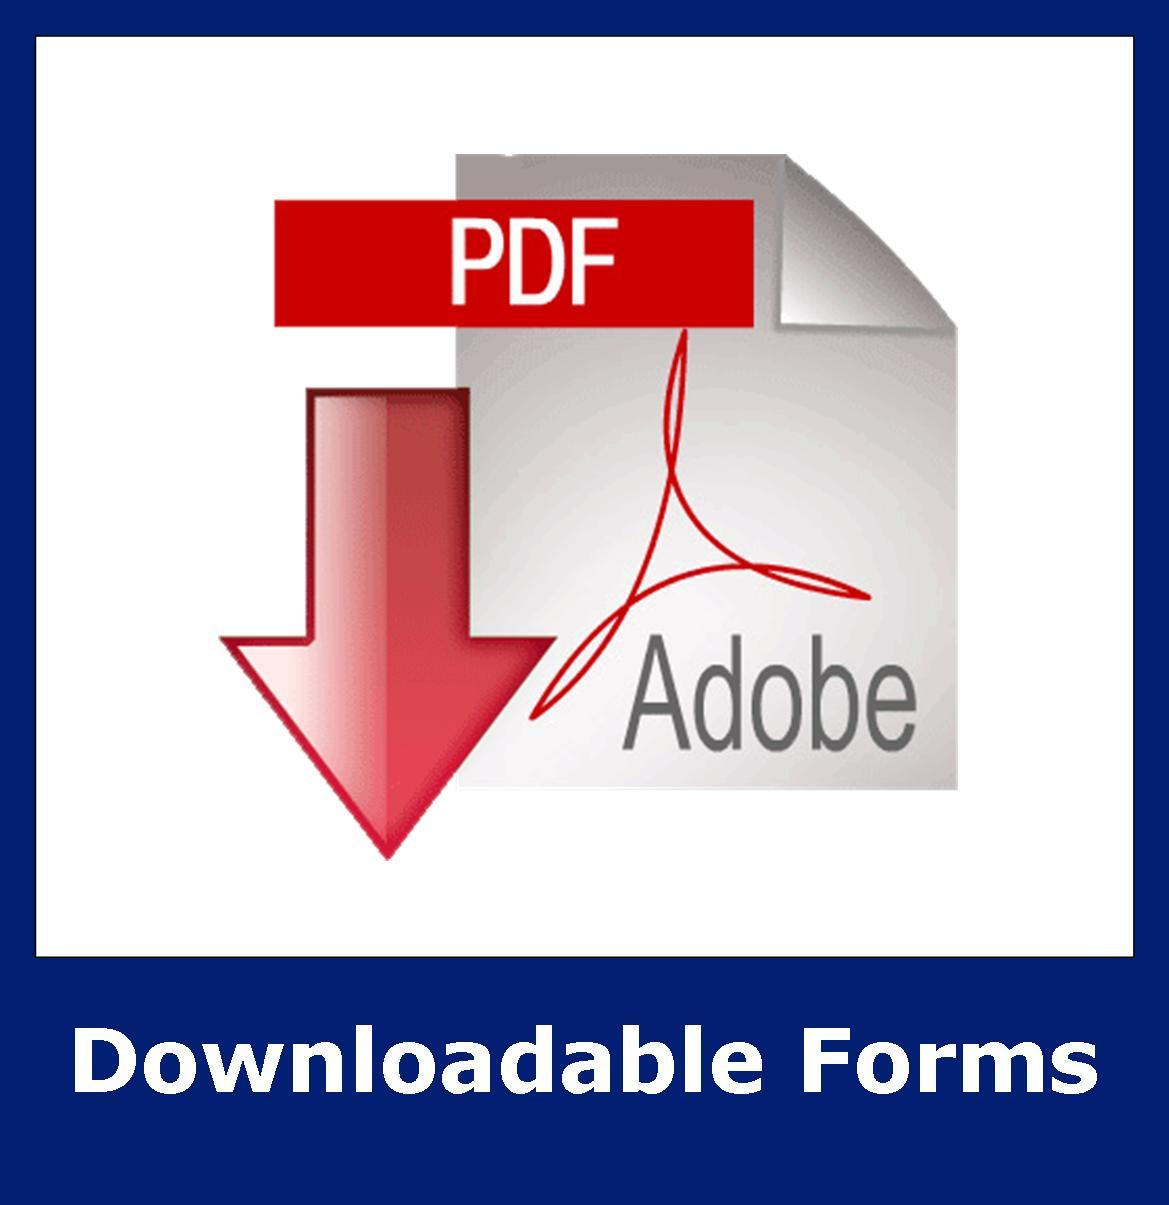 Downloadable PDF Forms